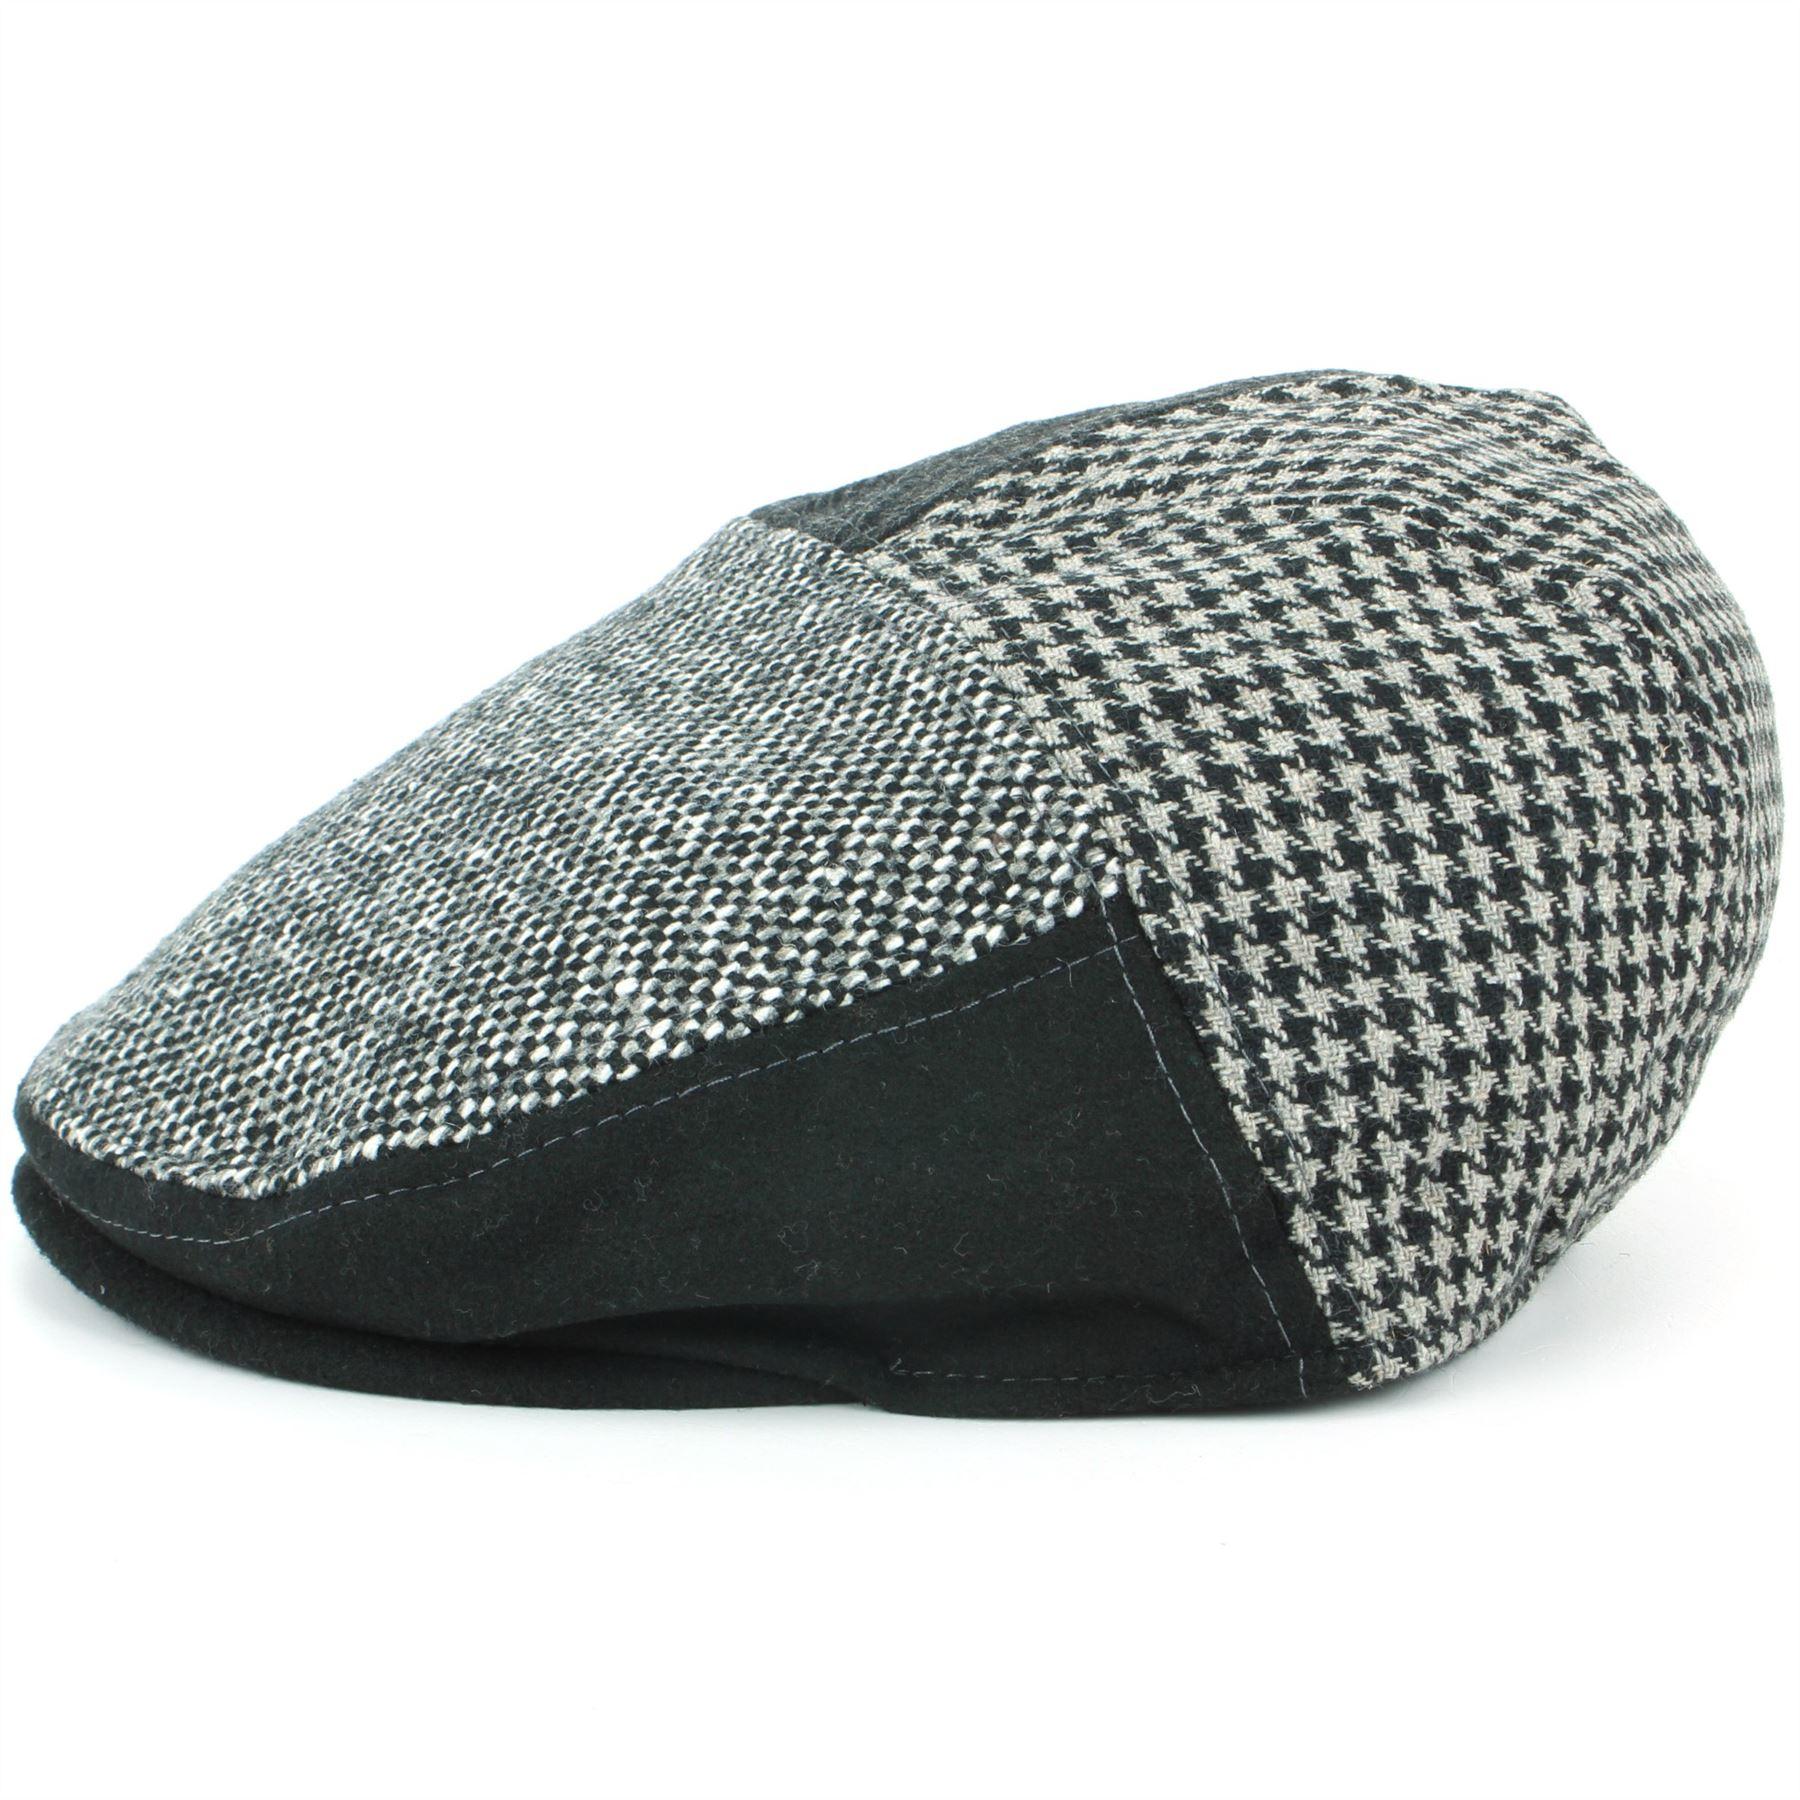 Hawkins Patchwork Tweed Flat Cap